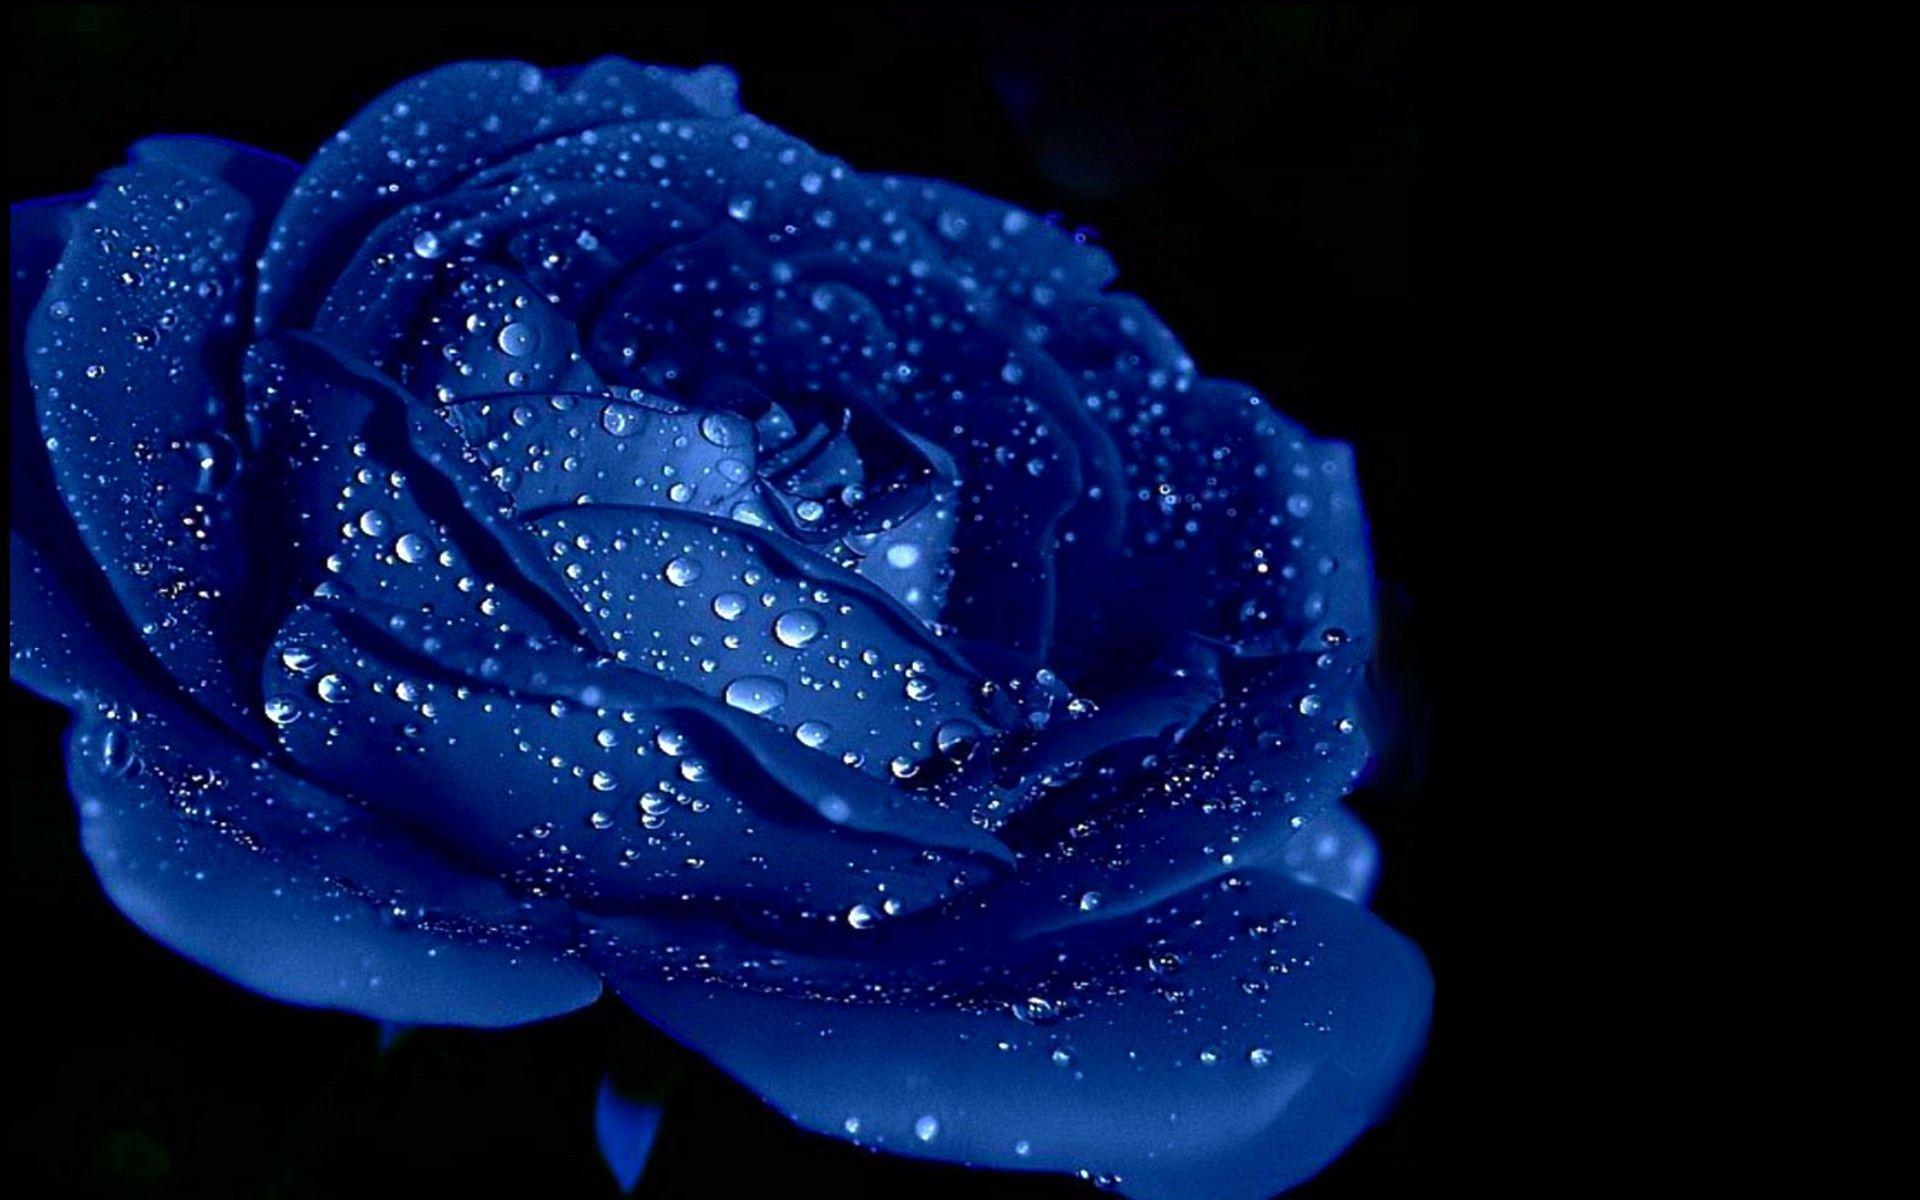 Blue rose backgrounds wallpaper cave - Samsung rose wallpaper ...